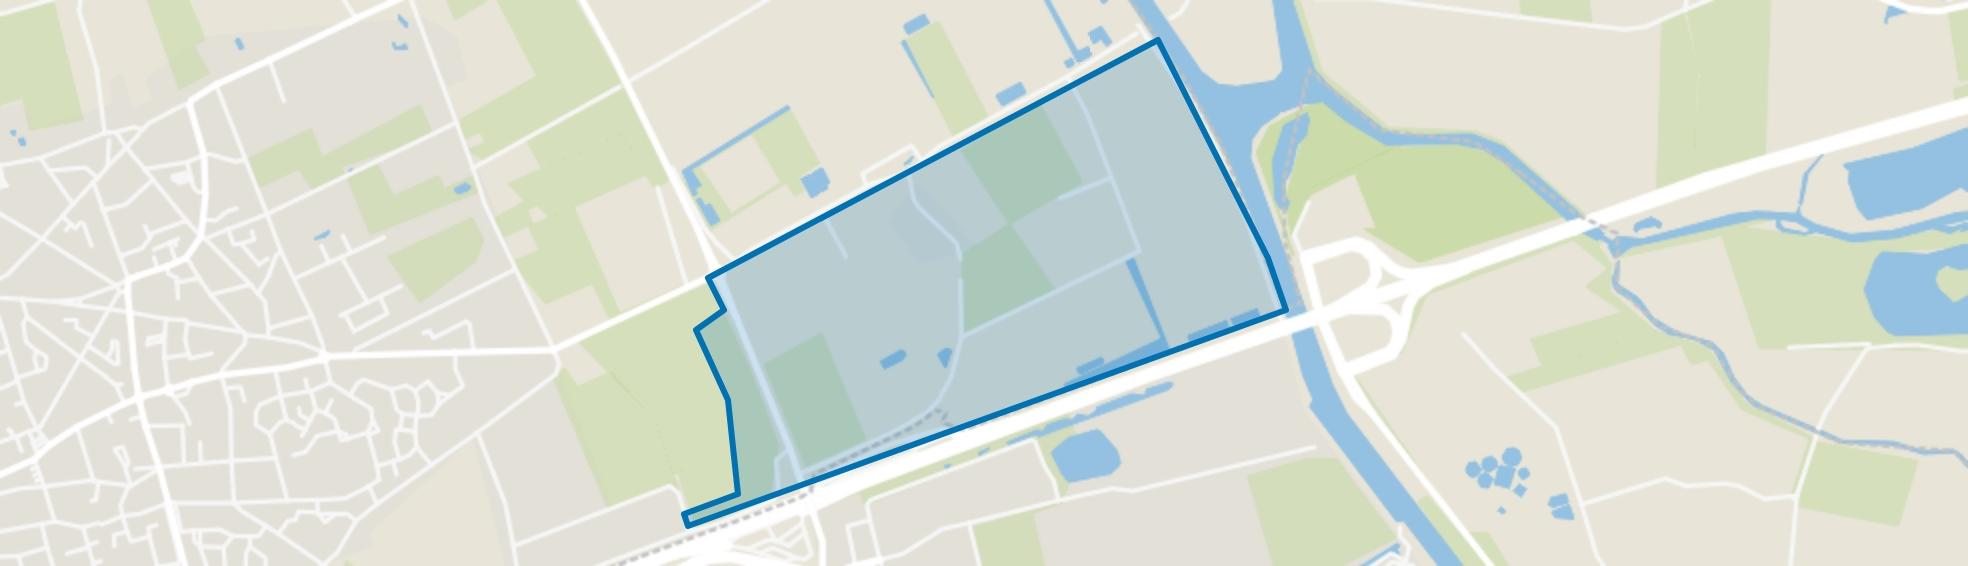 Tuinbouwgebied, Made map